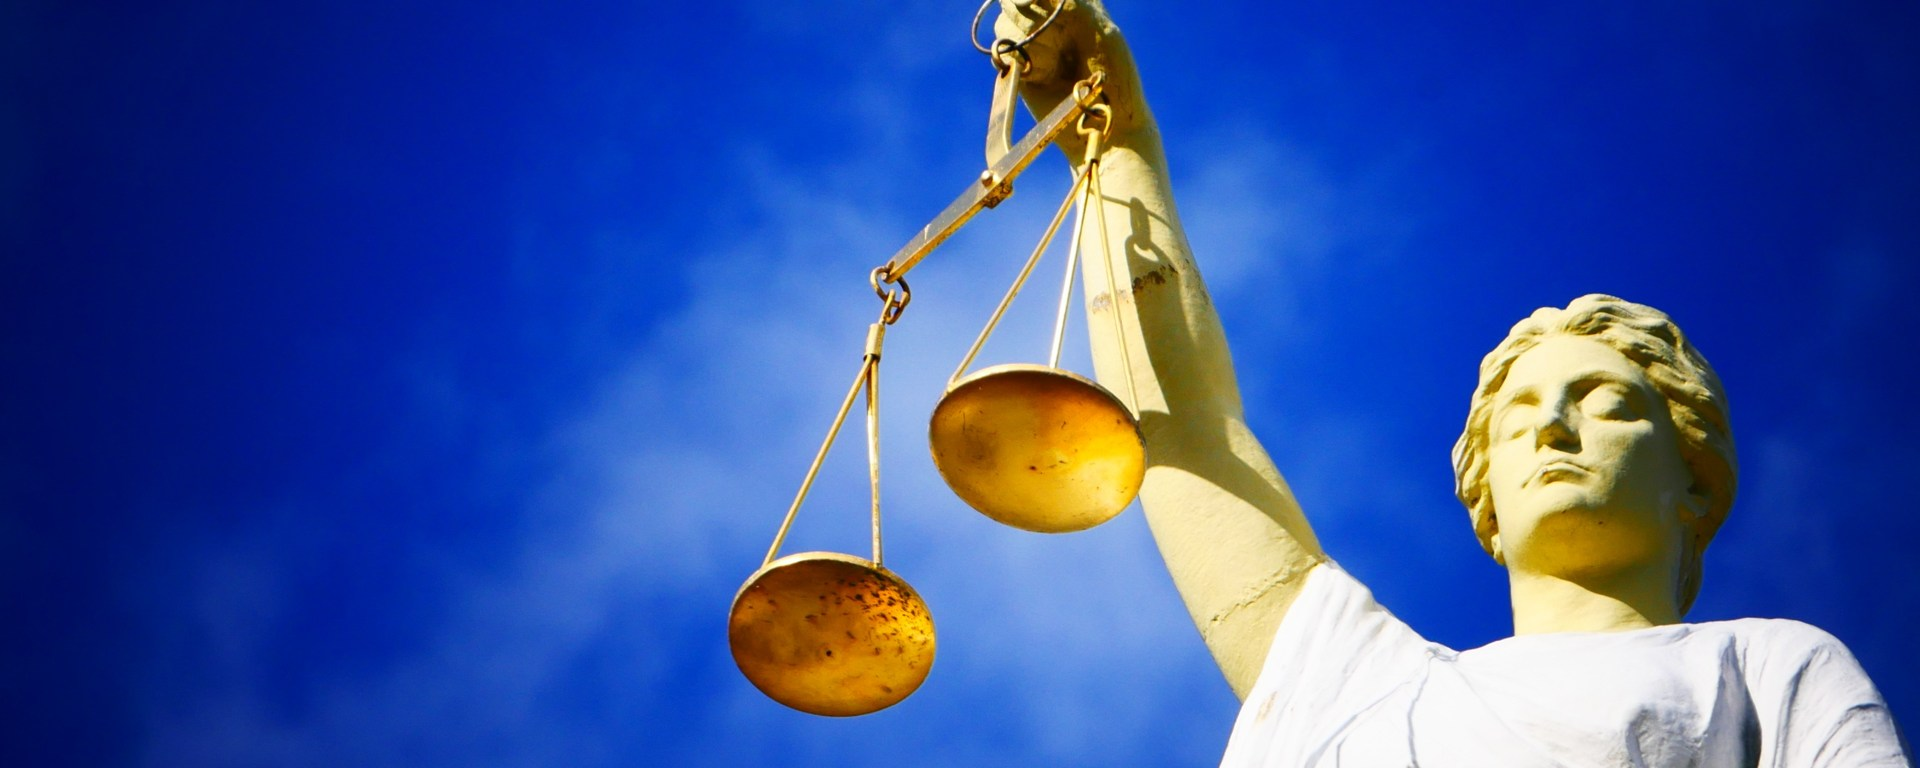 how hard is criminal justice